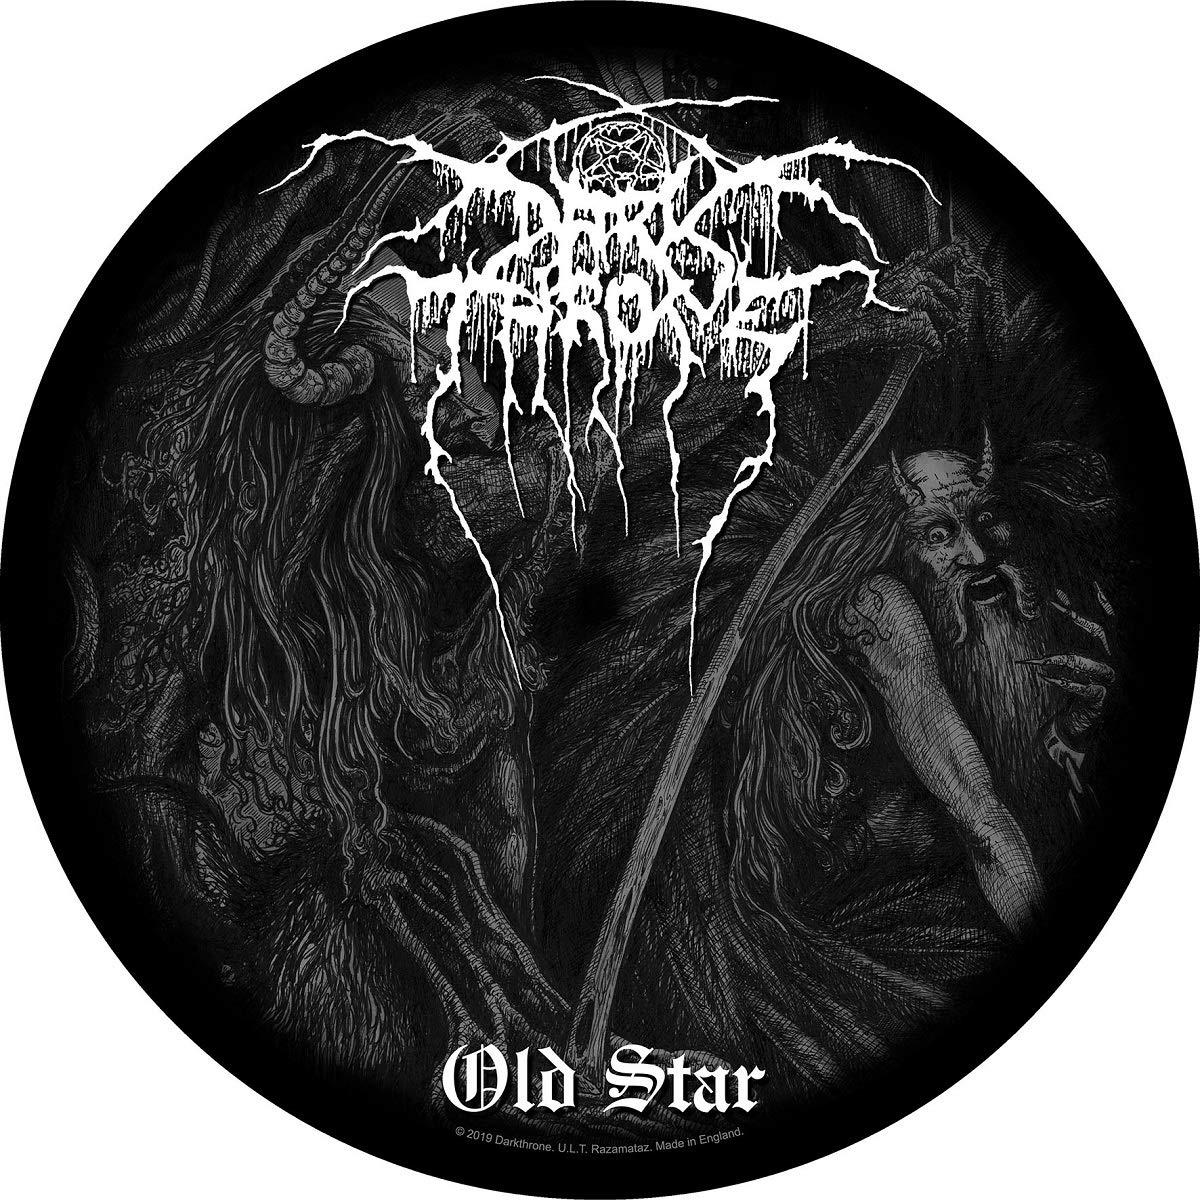 Image of Tappetino Per Giradischi. Darkthrone: Old Star